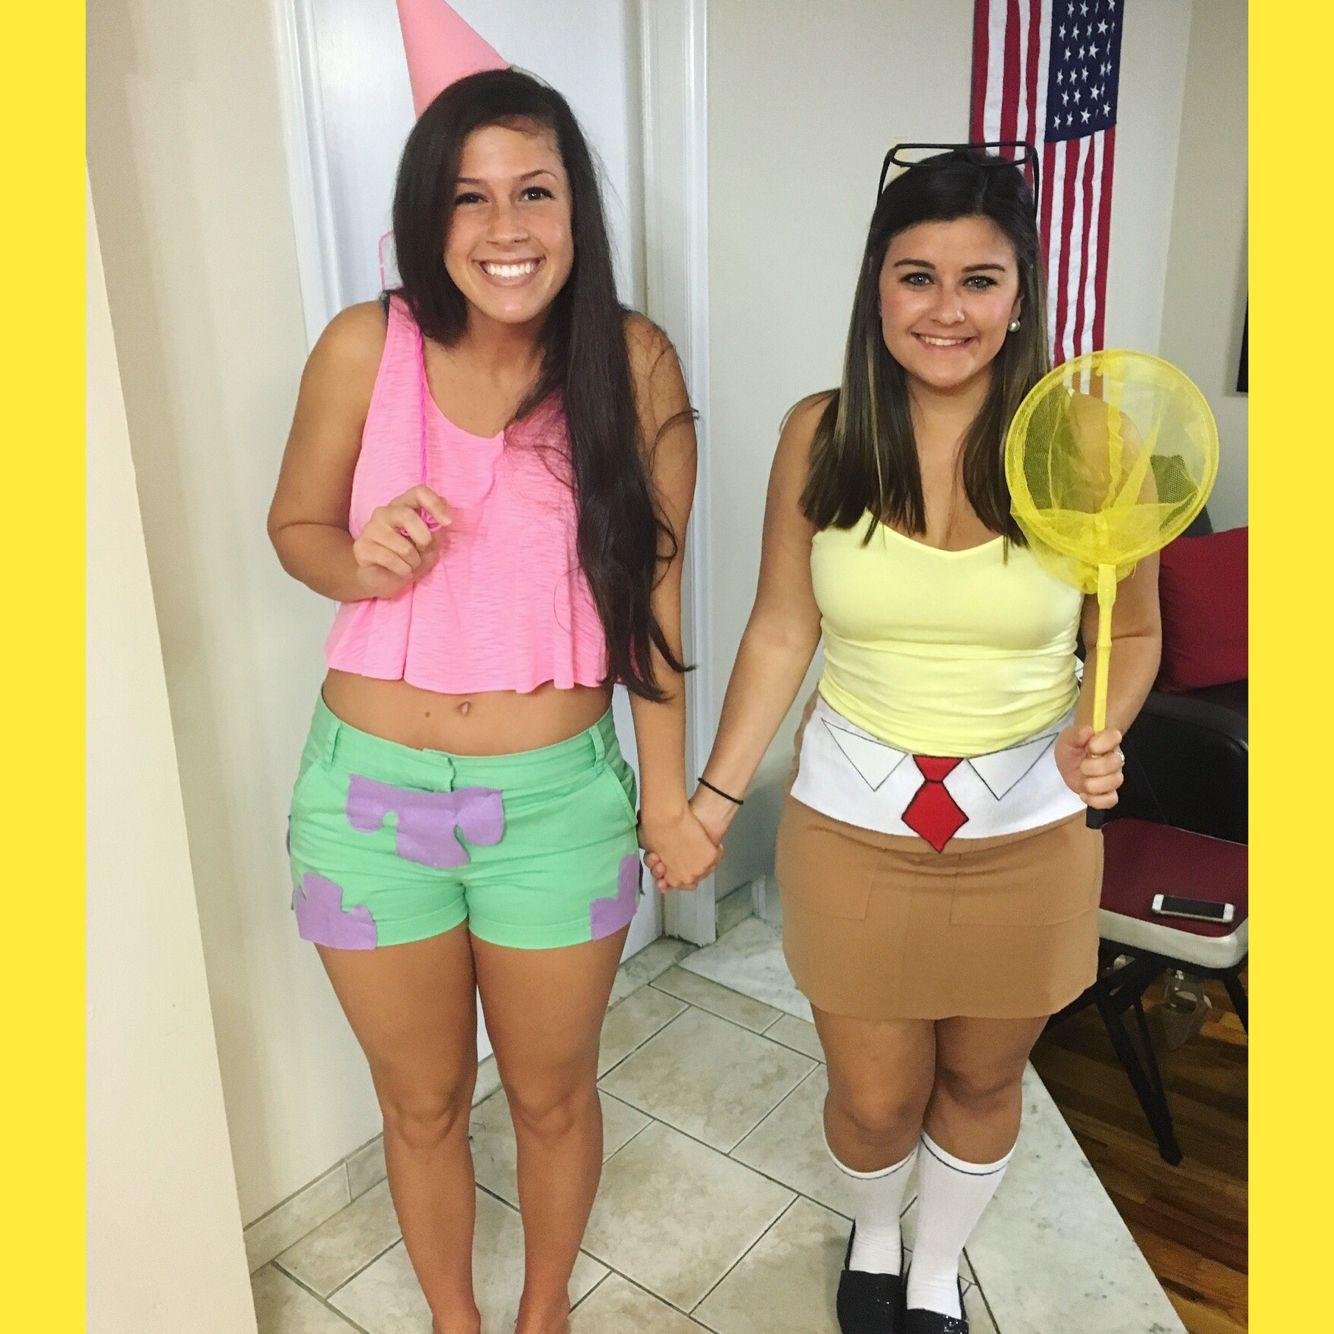 SpongeBob and Patrick costume! #halloween  sc 1 st  Pinterest & SpongeBob and Patrick costume! #halloween | h a l l o w e e n ...